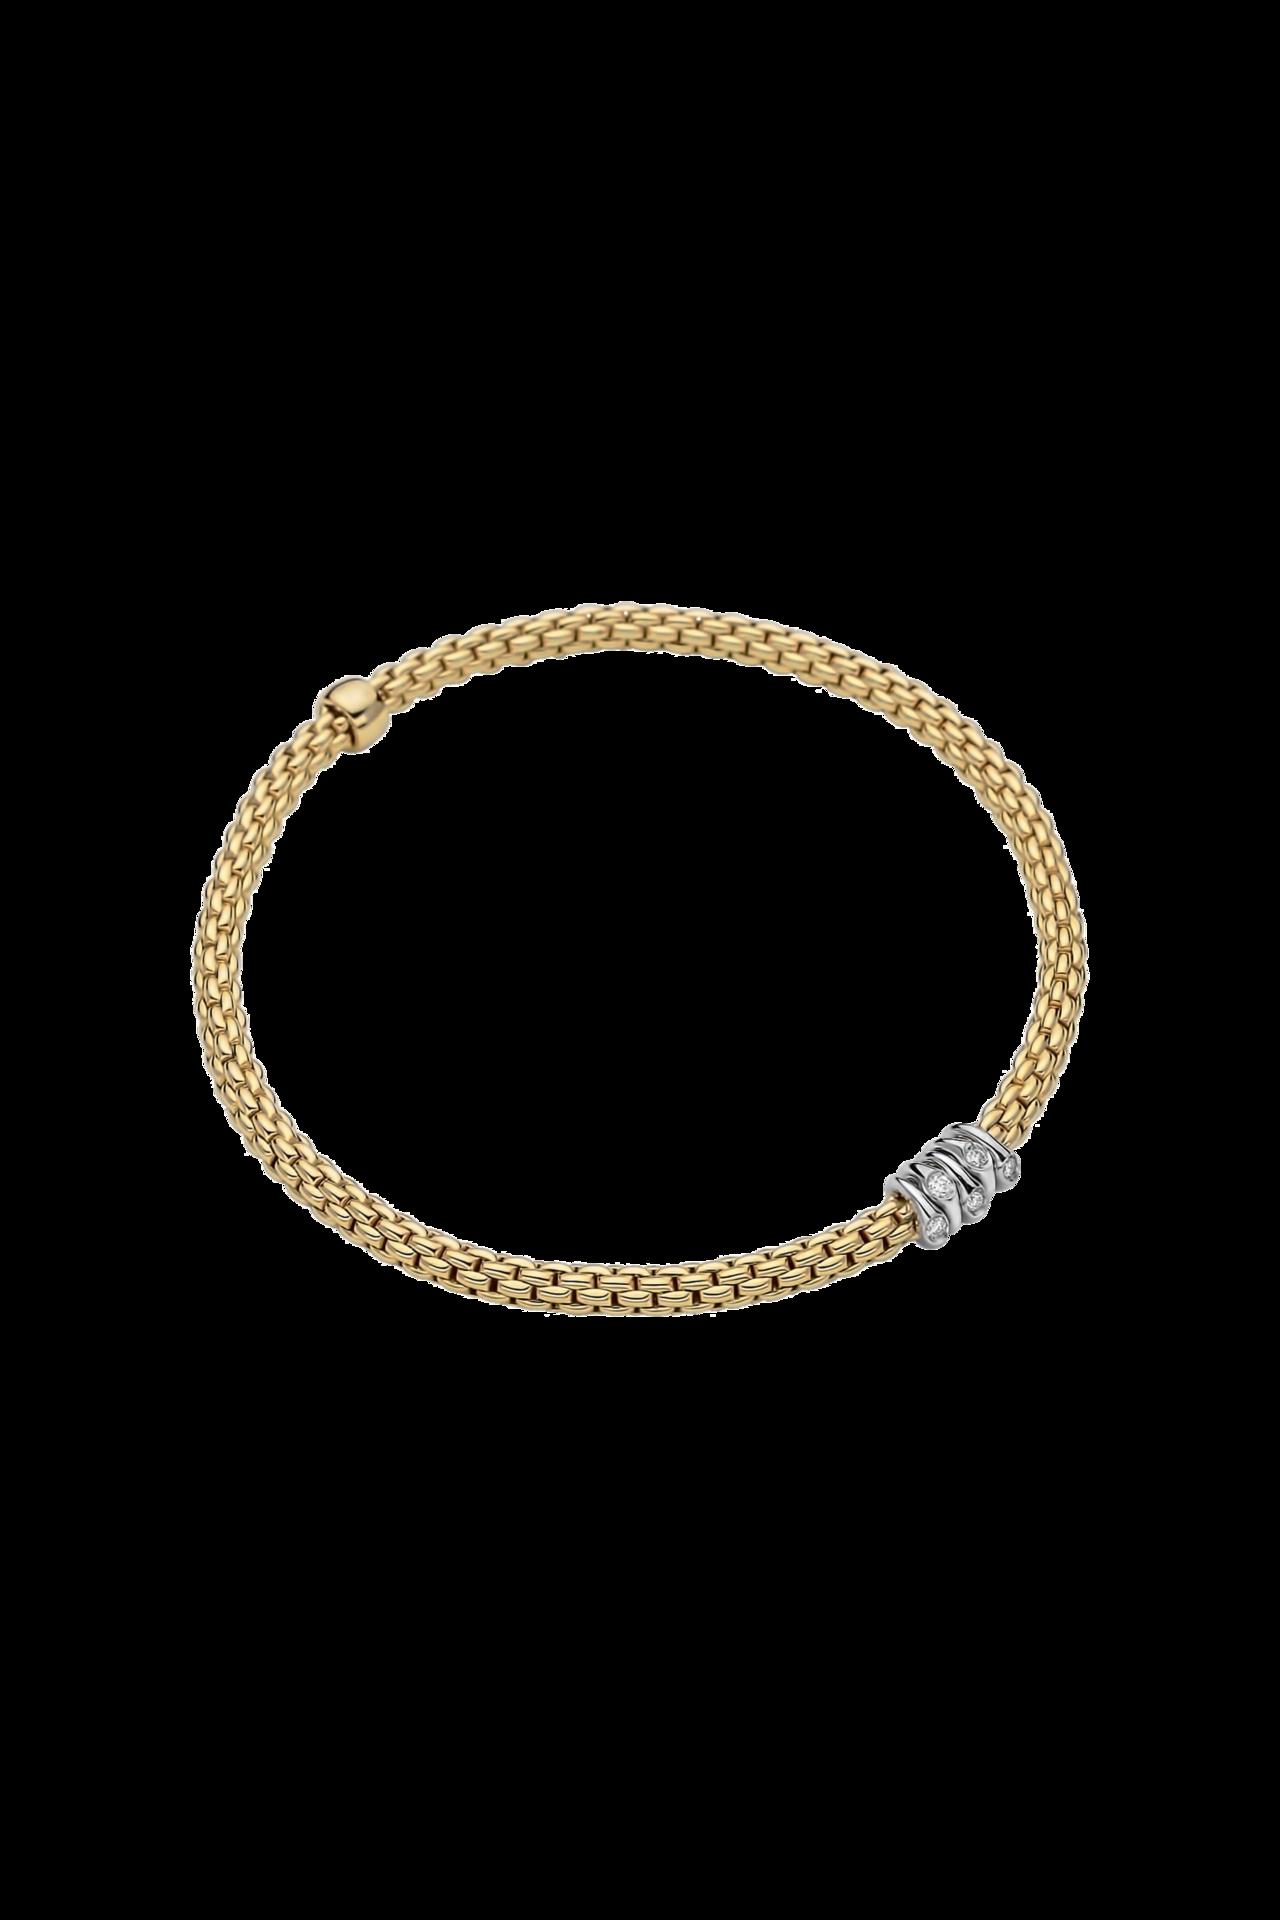 FOPE Flex'it Armband mit Brillanten